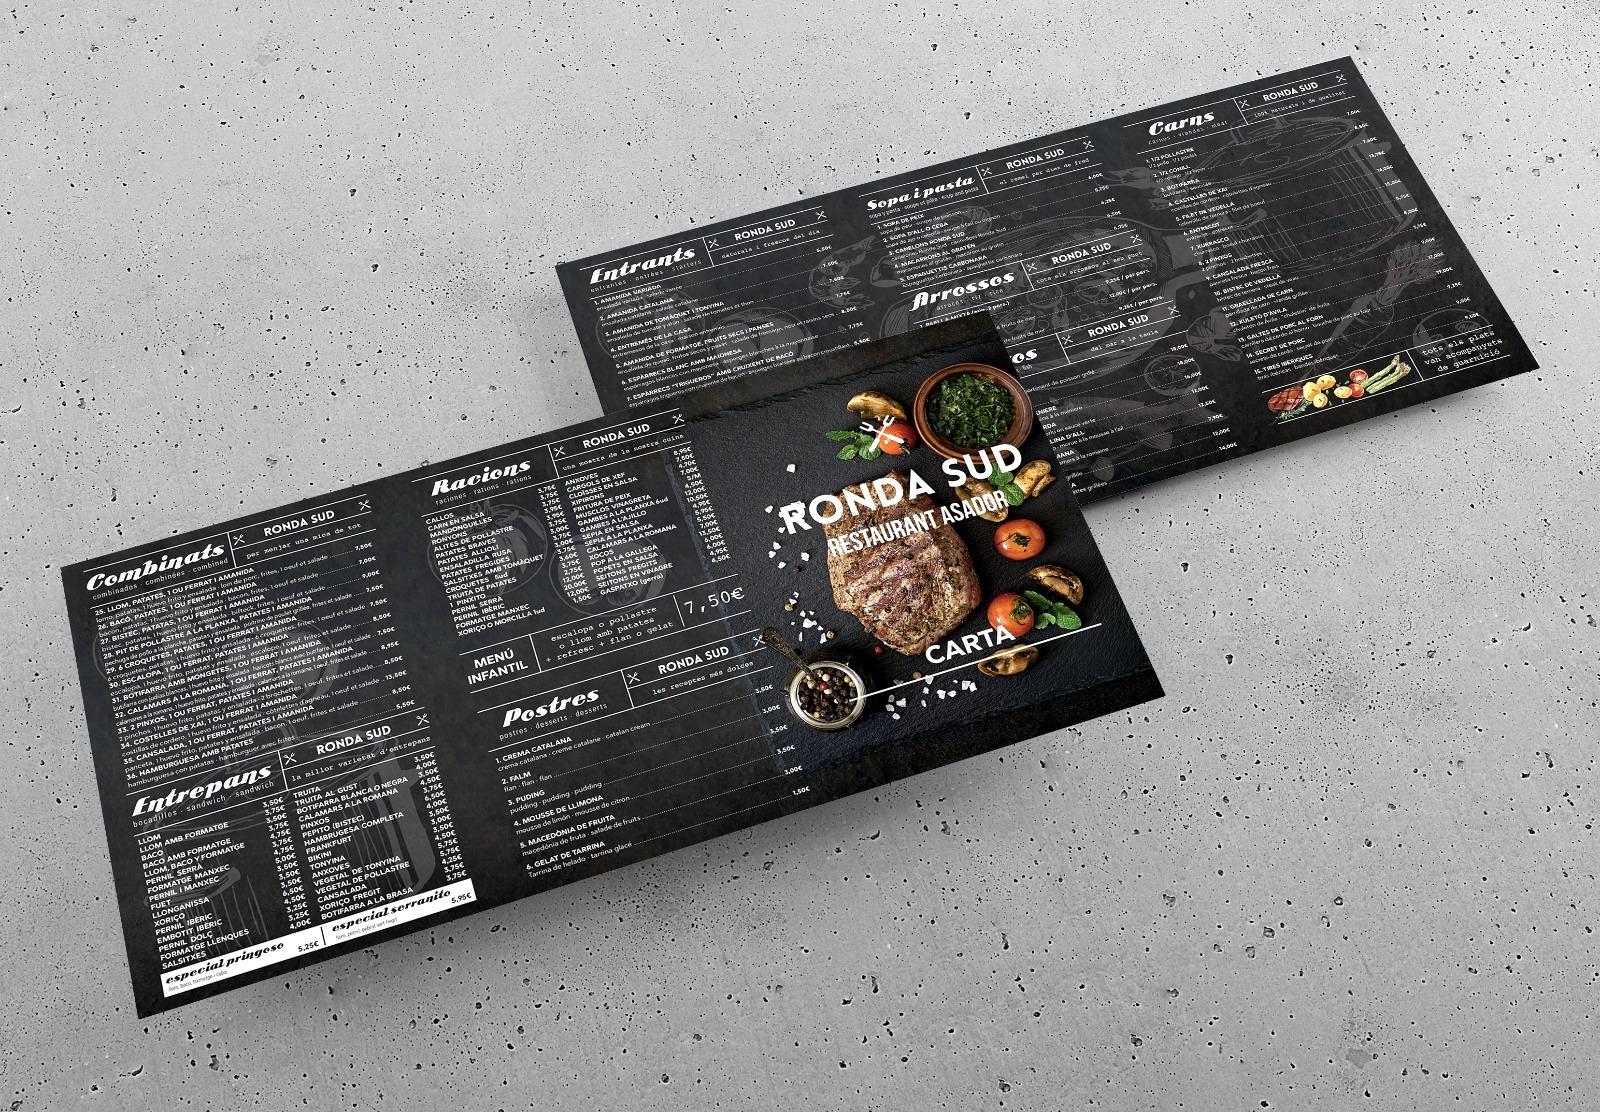 RONDASUD - Cartes